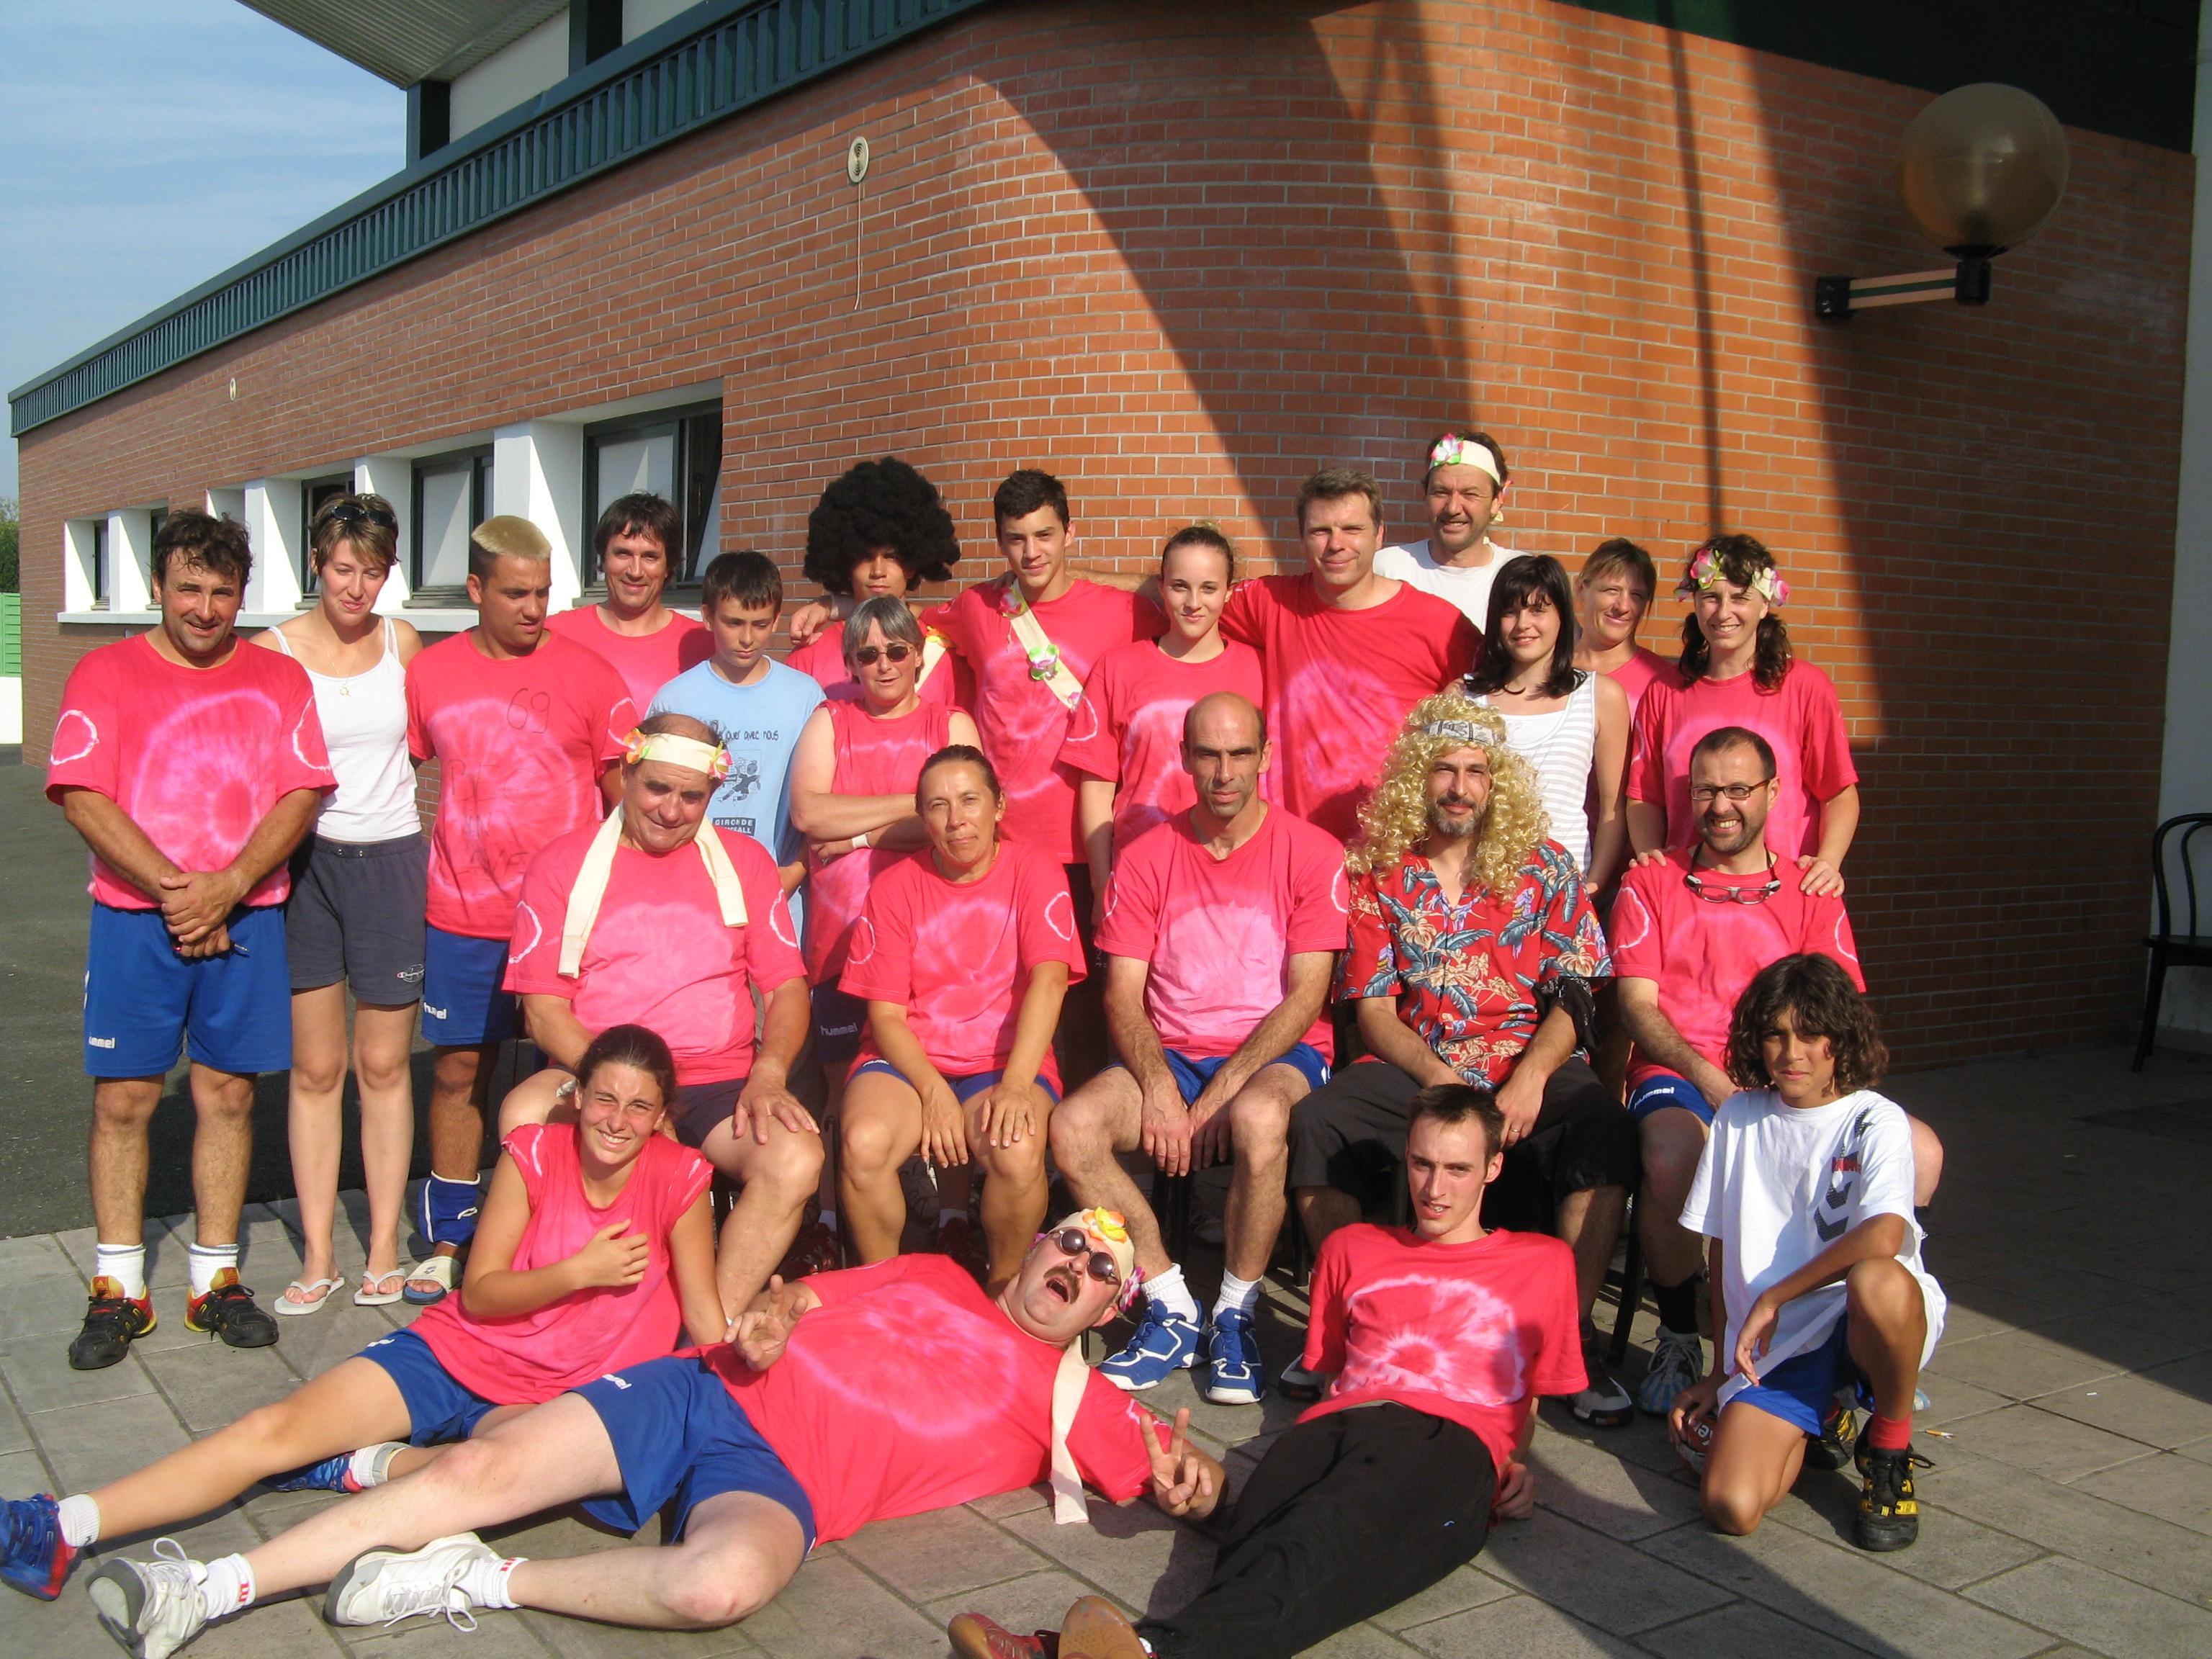 Tournoi-dAnglet-Juin-2007-19